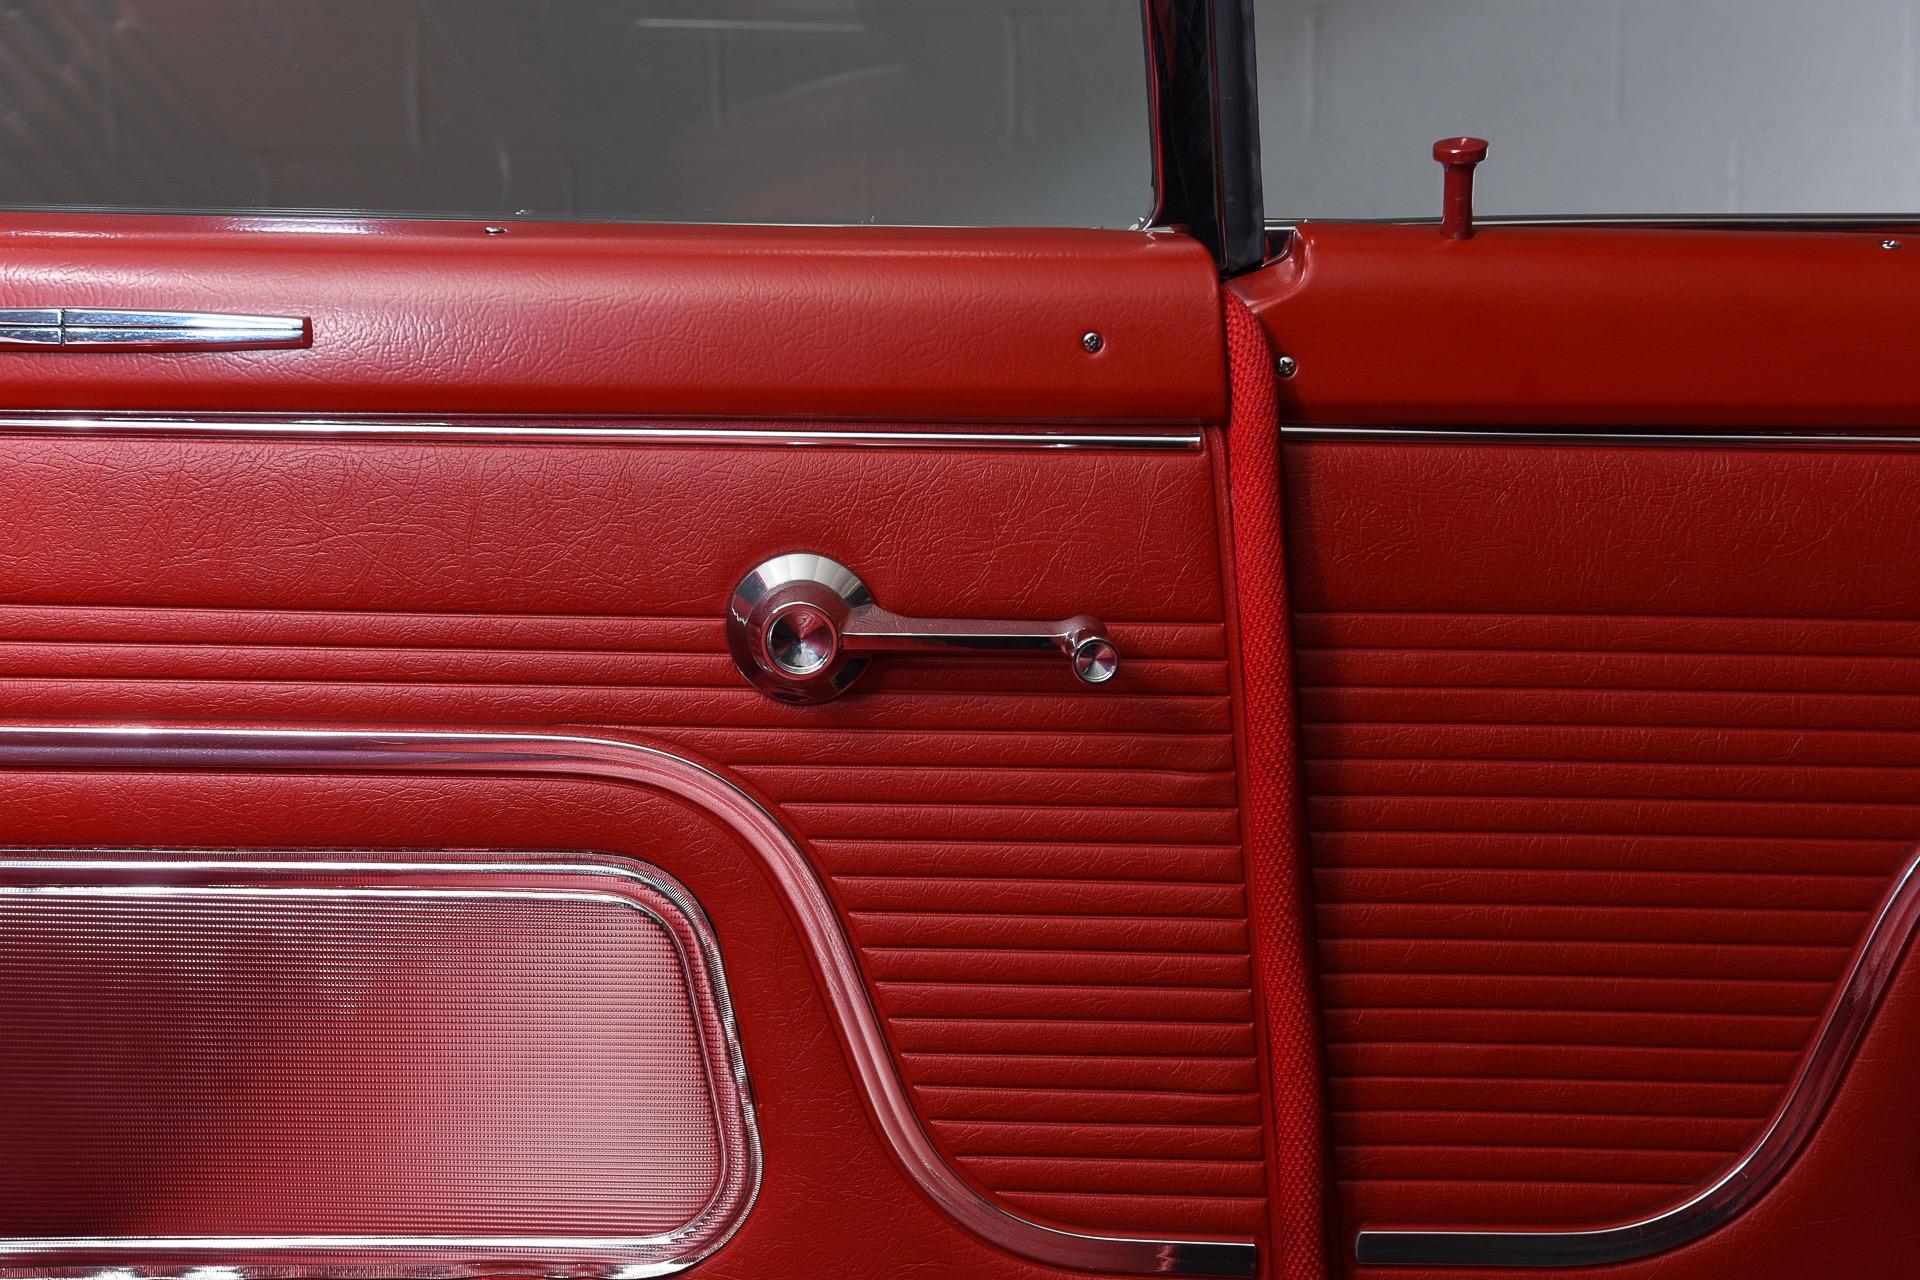 1963 Ford Galaxie 500 Lightweight